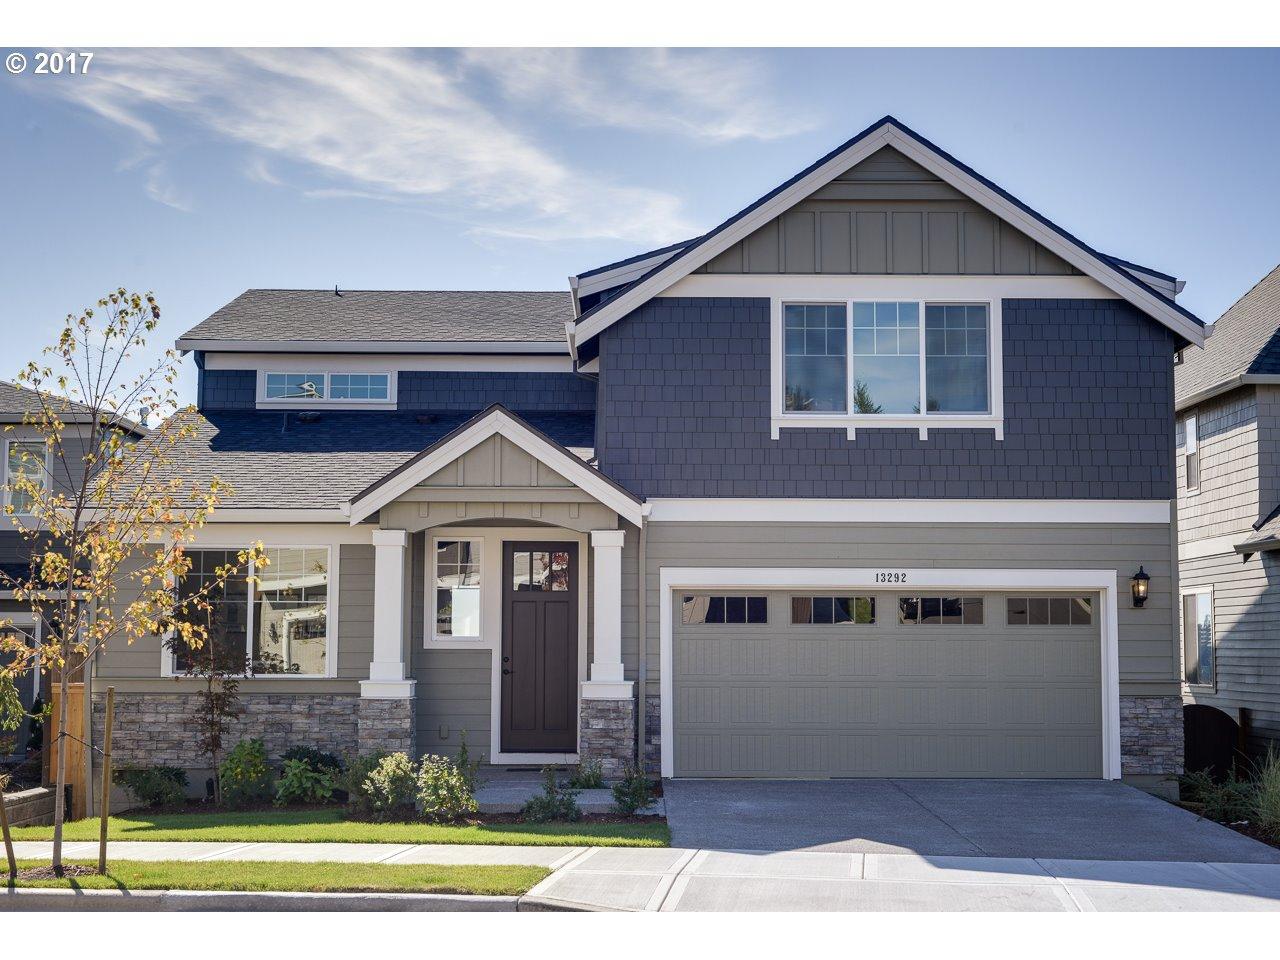 13292 NW GREENWOOD DR, Portland OR 97229